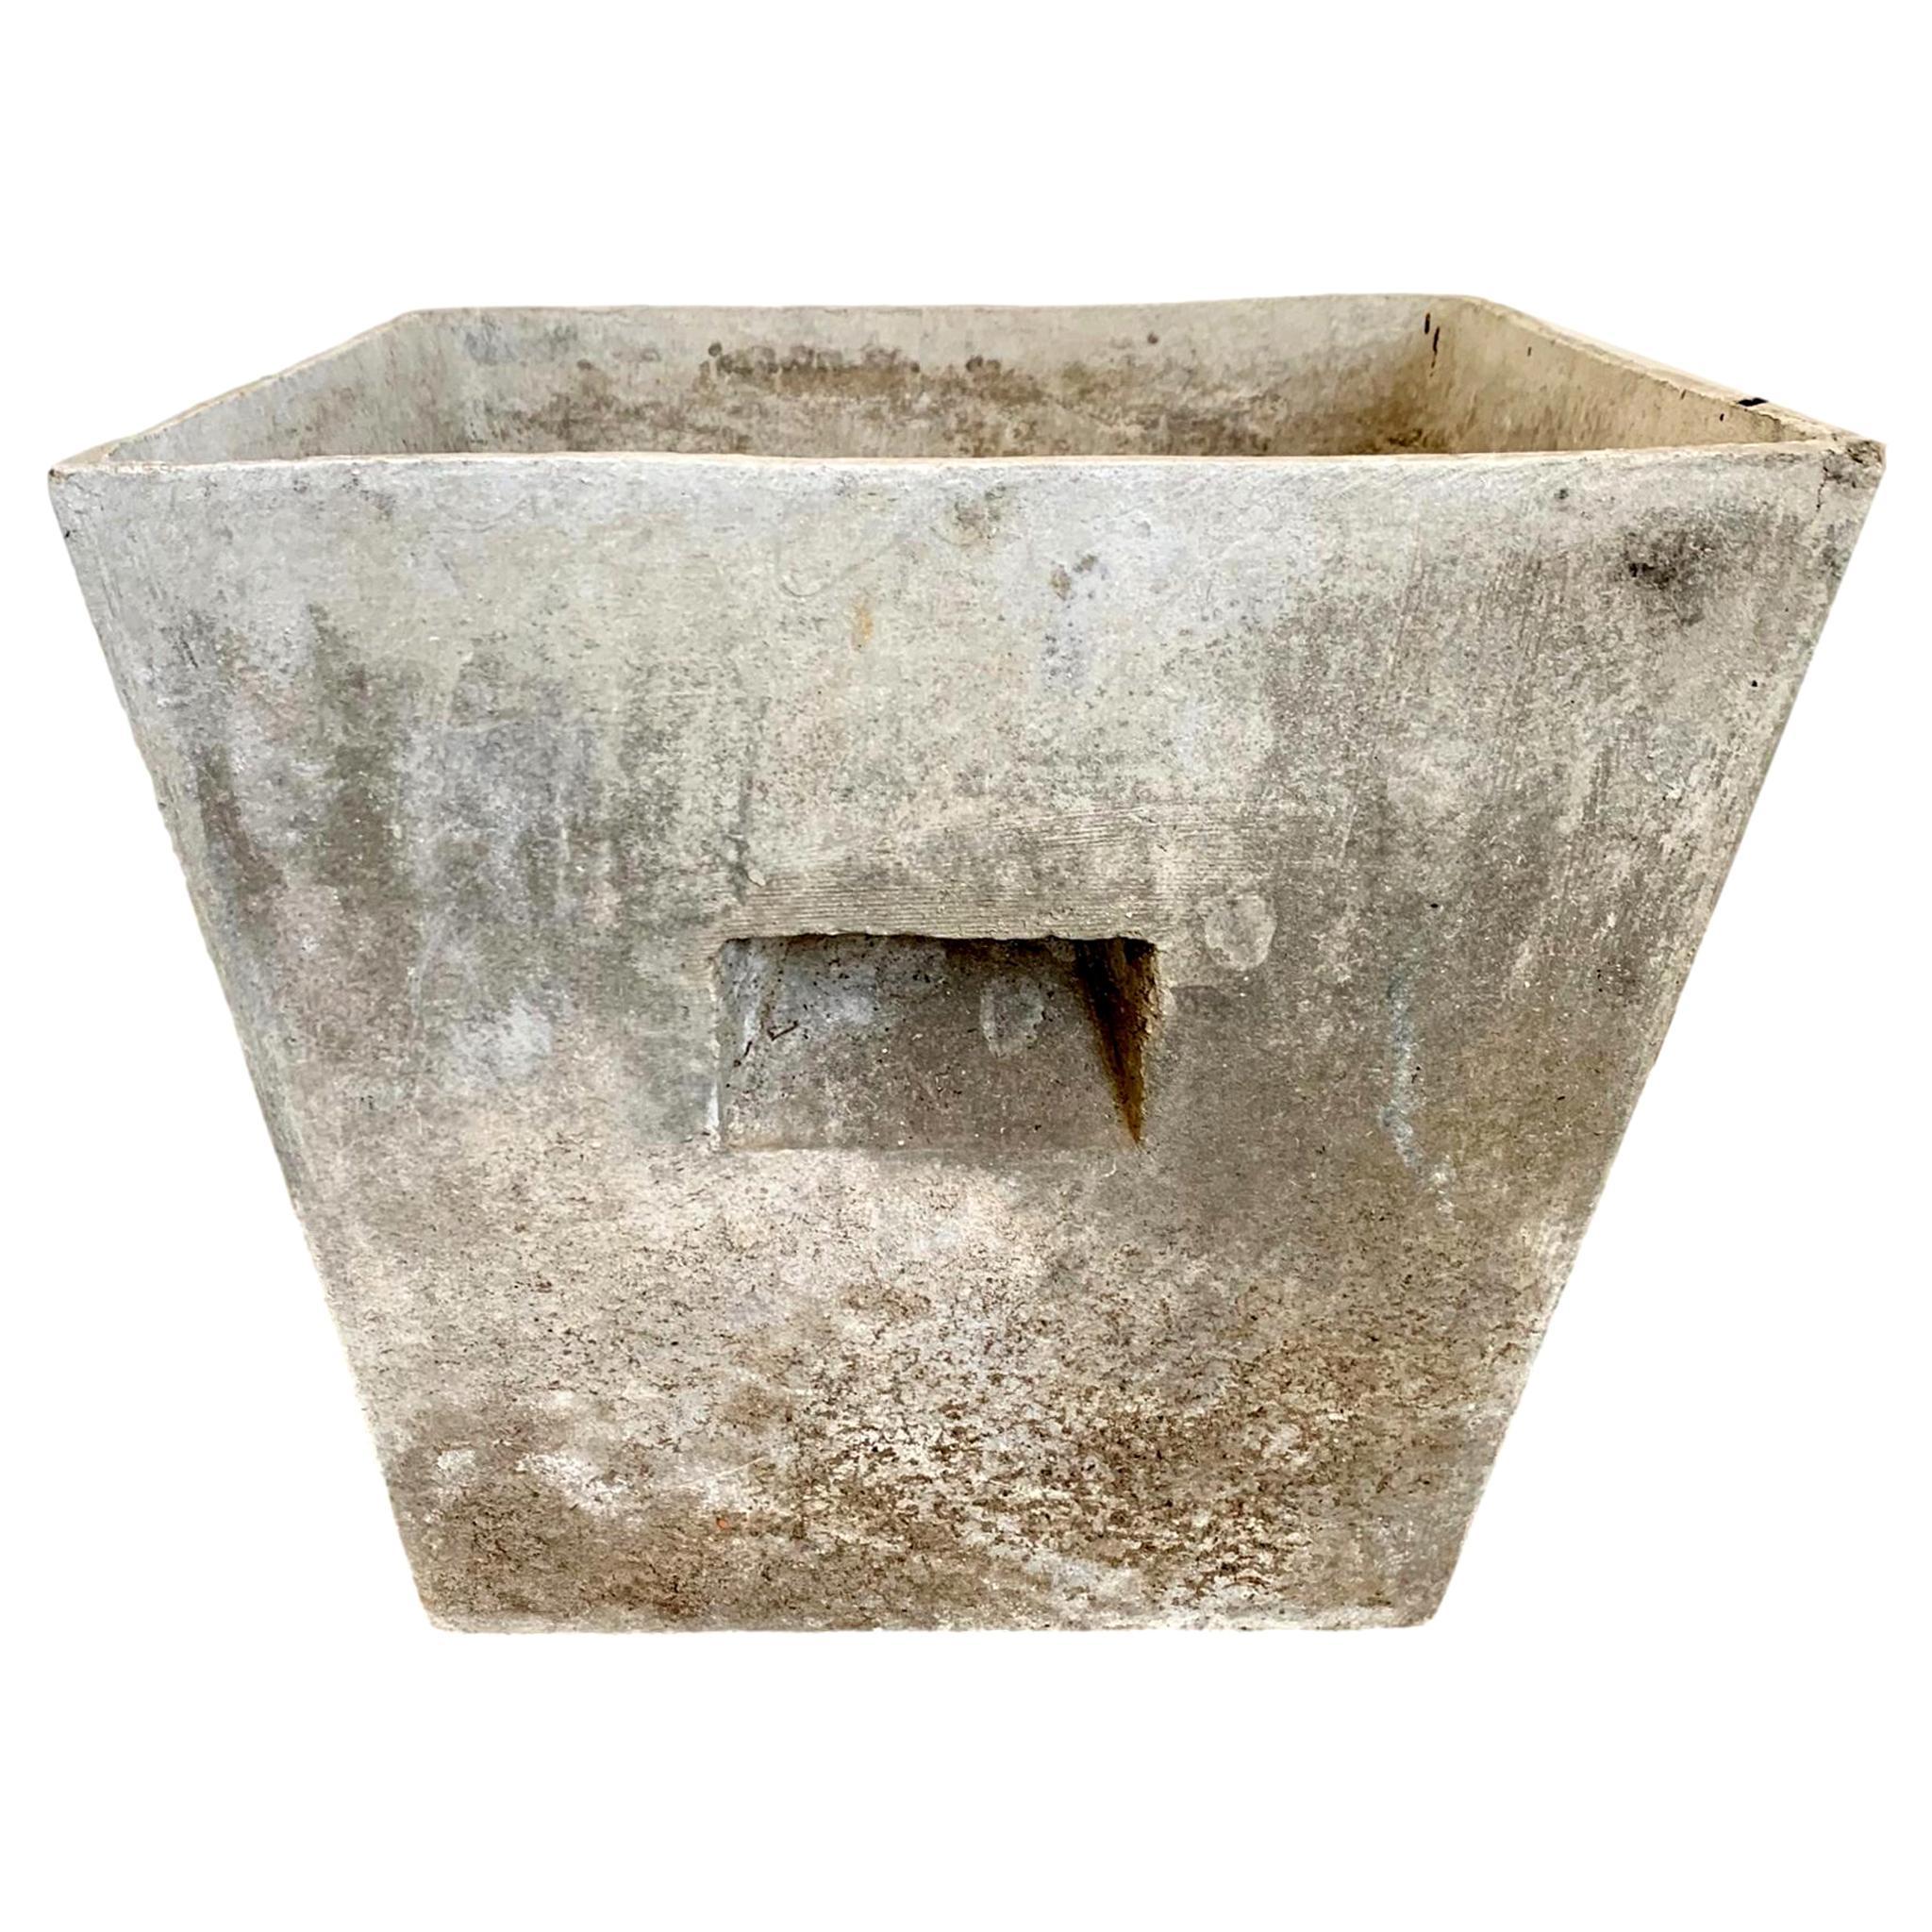 Willy Guhl Square Pot